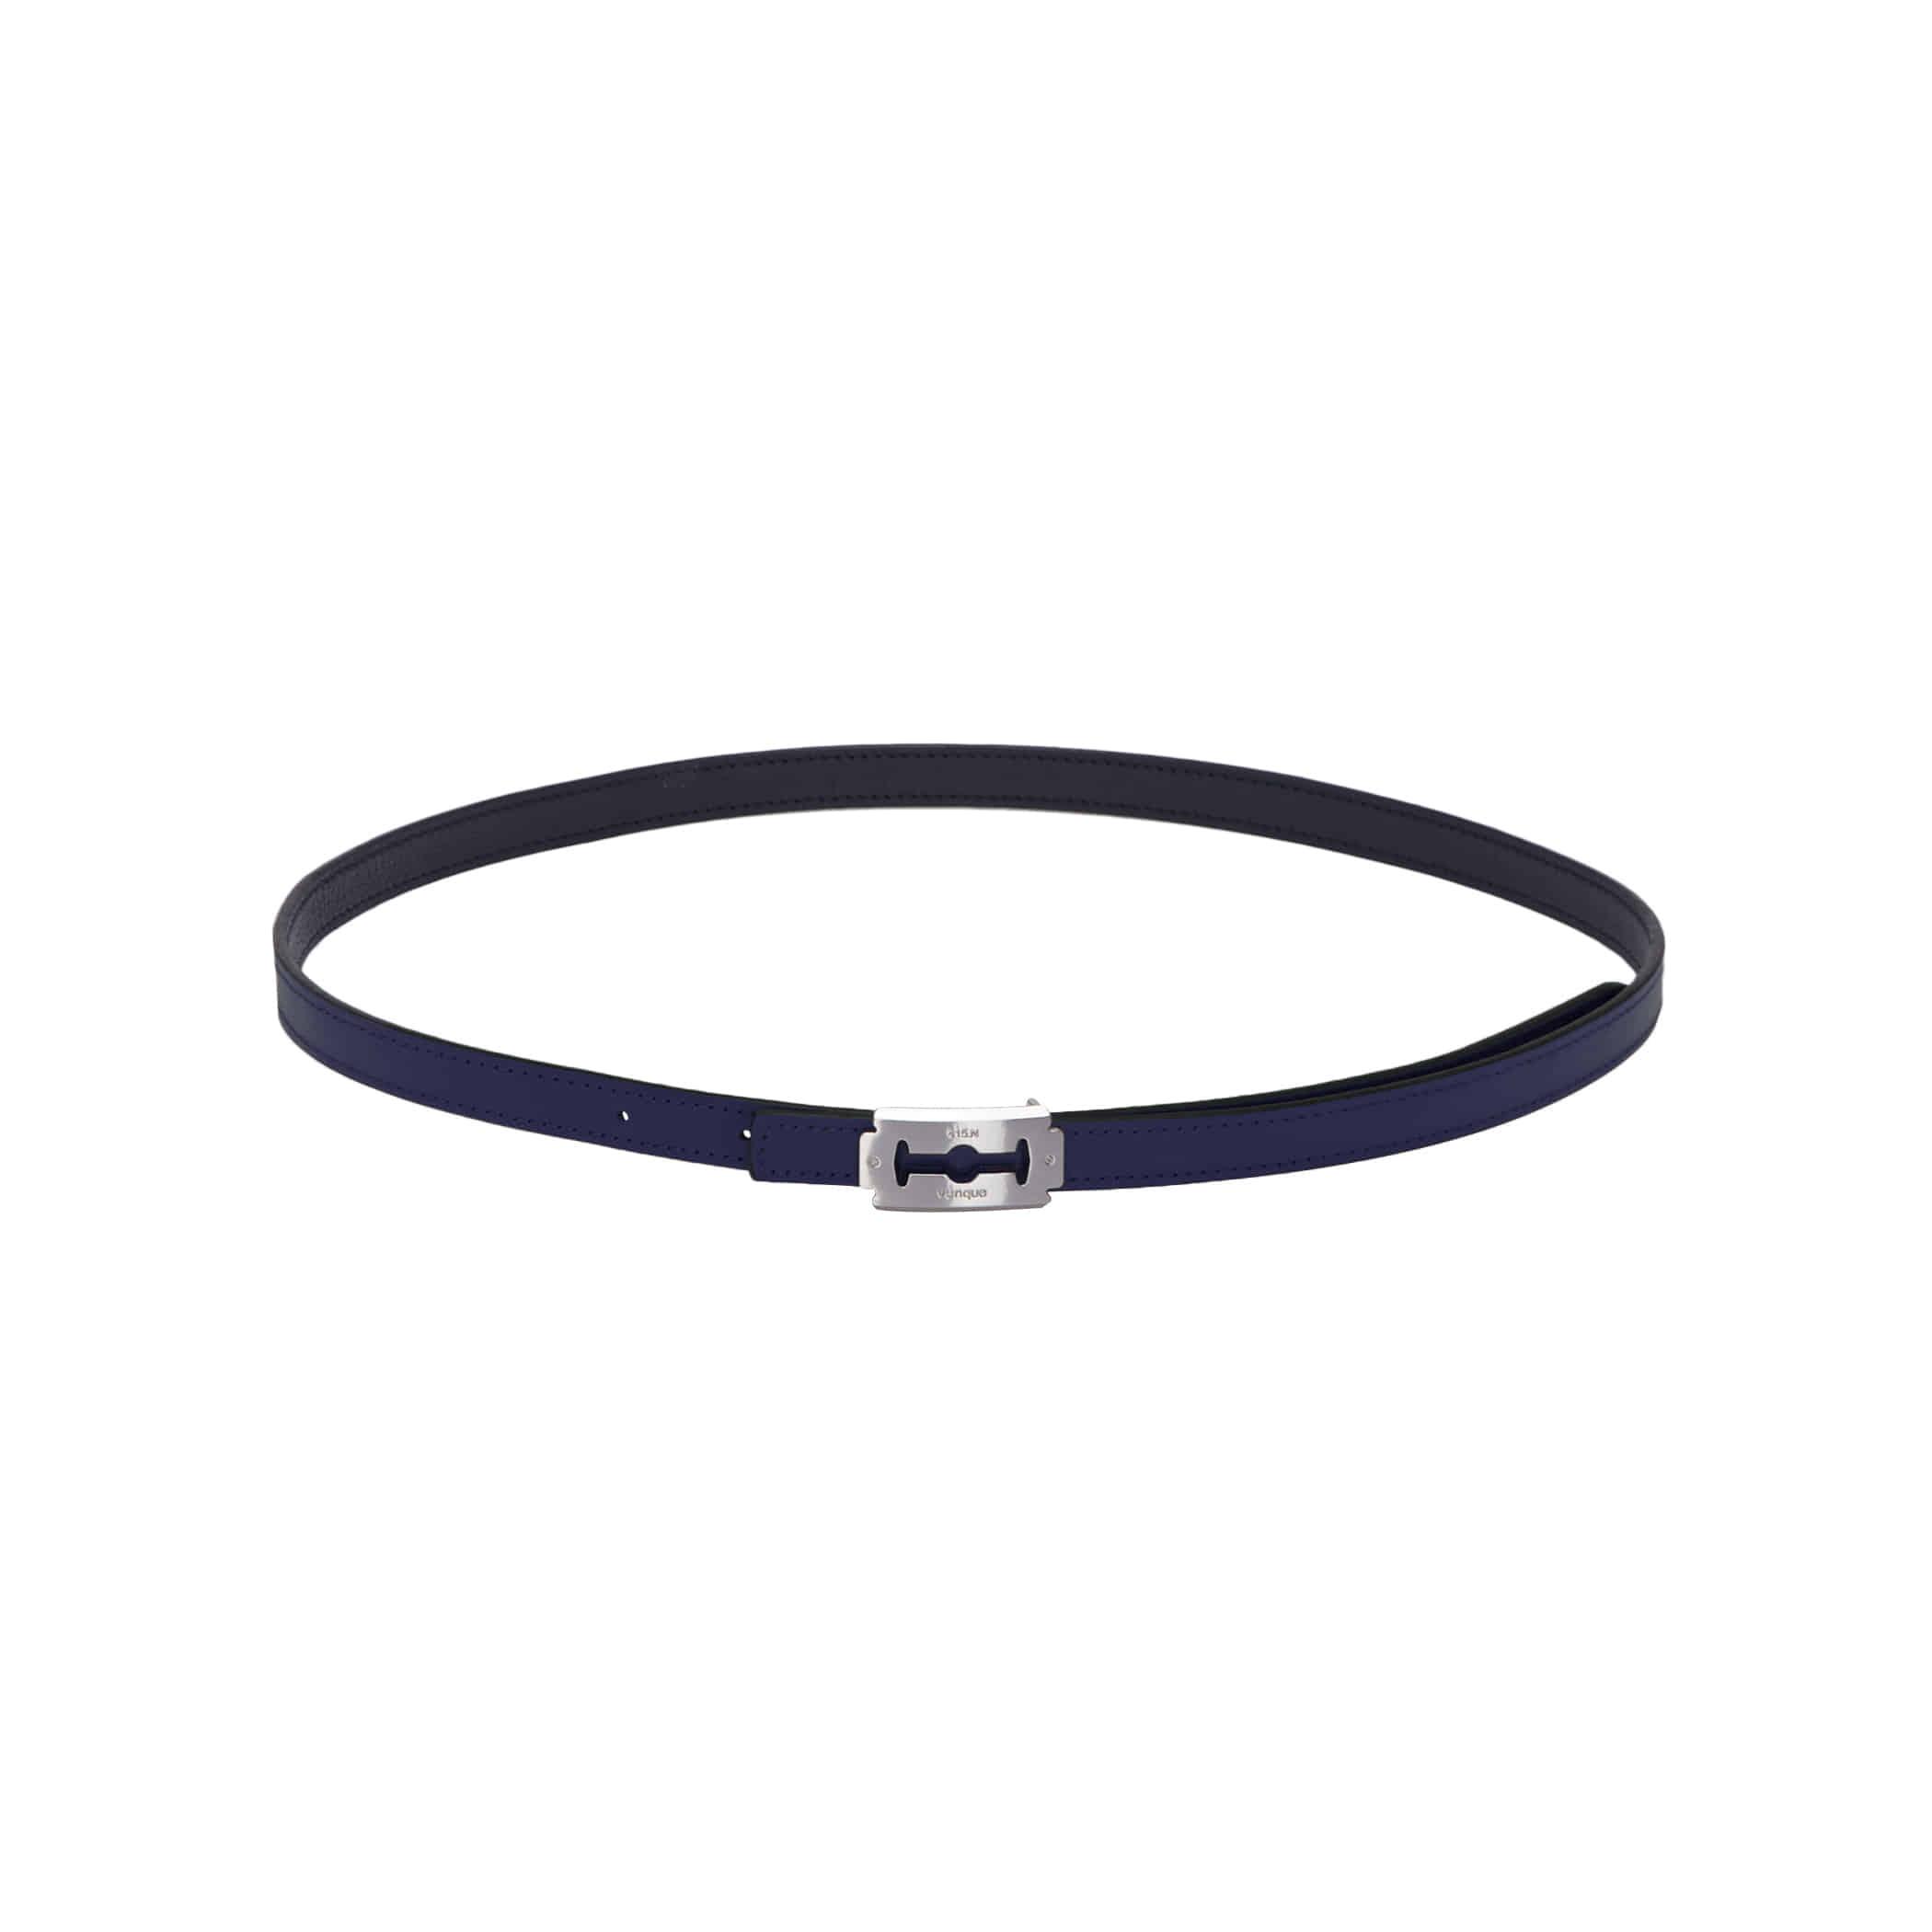 vunque razor belt L (분크 레이저 벨트 라지) Black